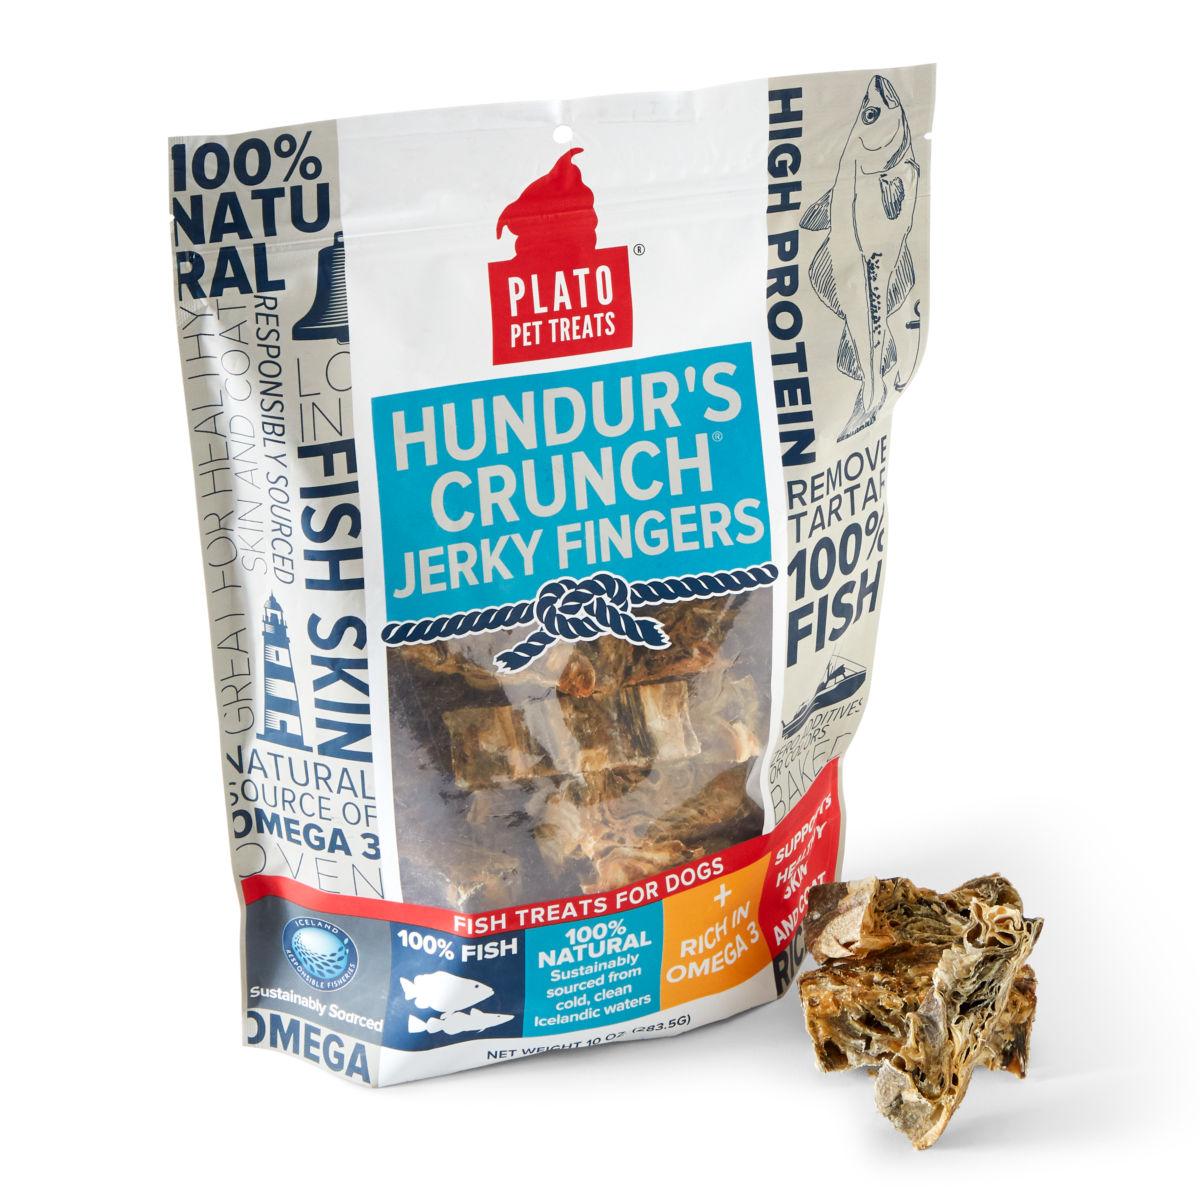 Hundur's Crunch Jerky Fingers - image number 0